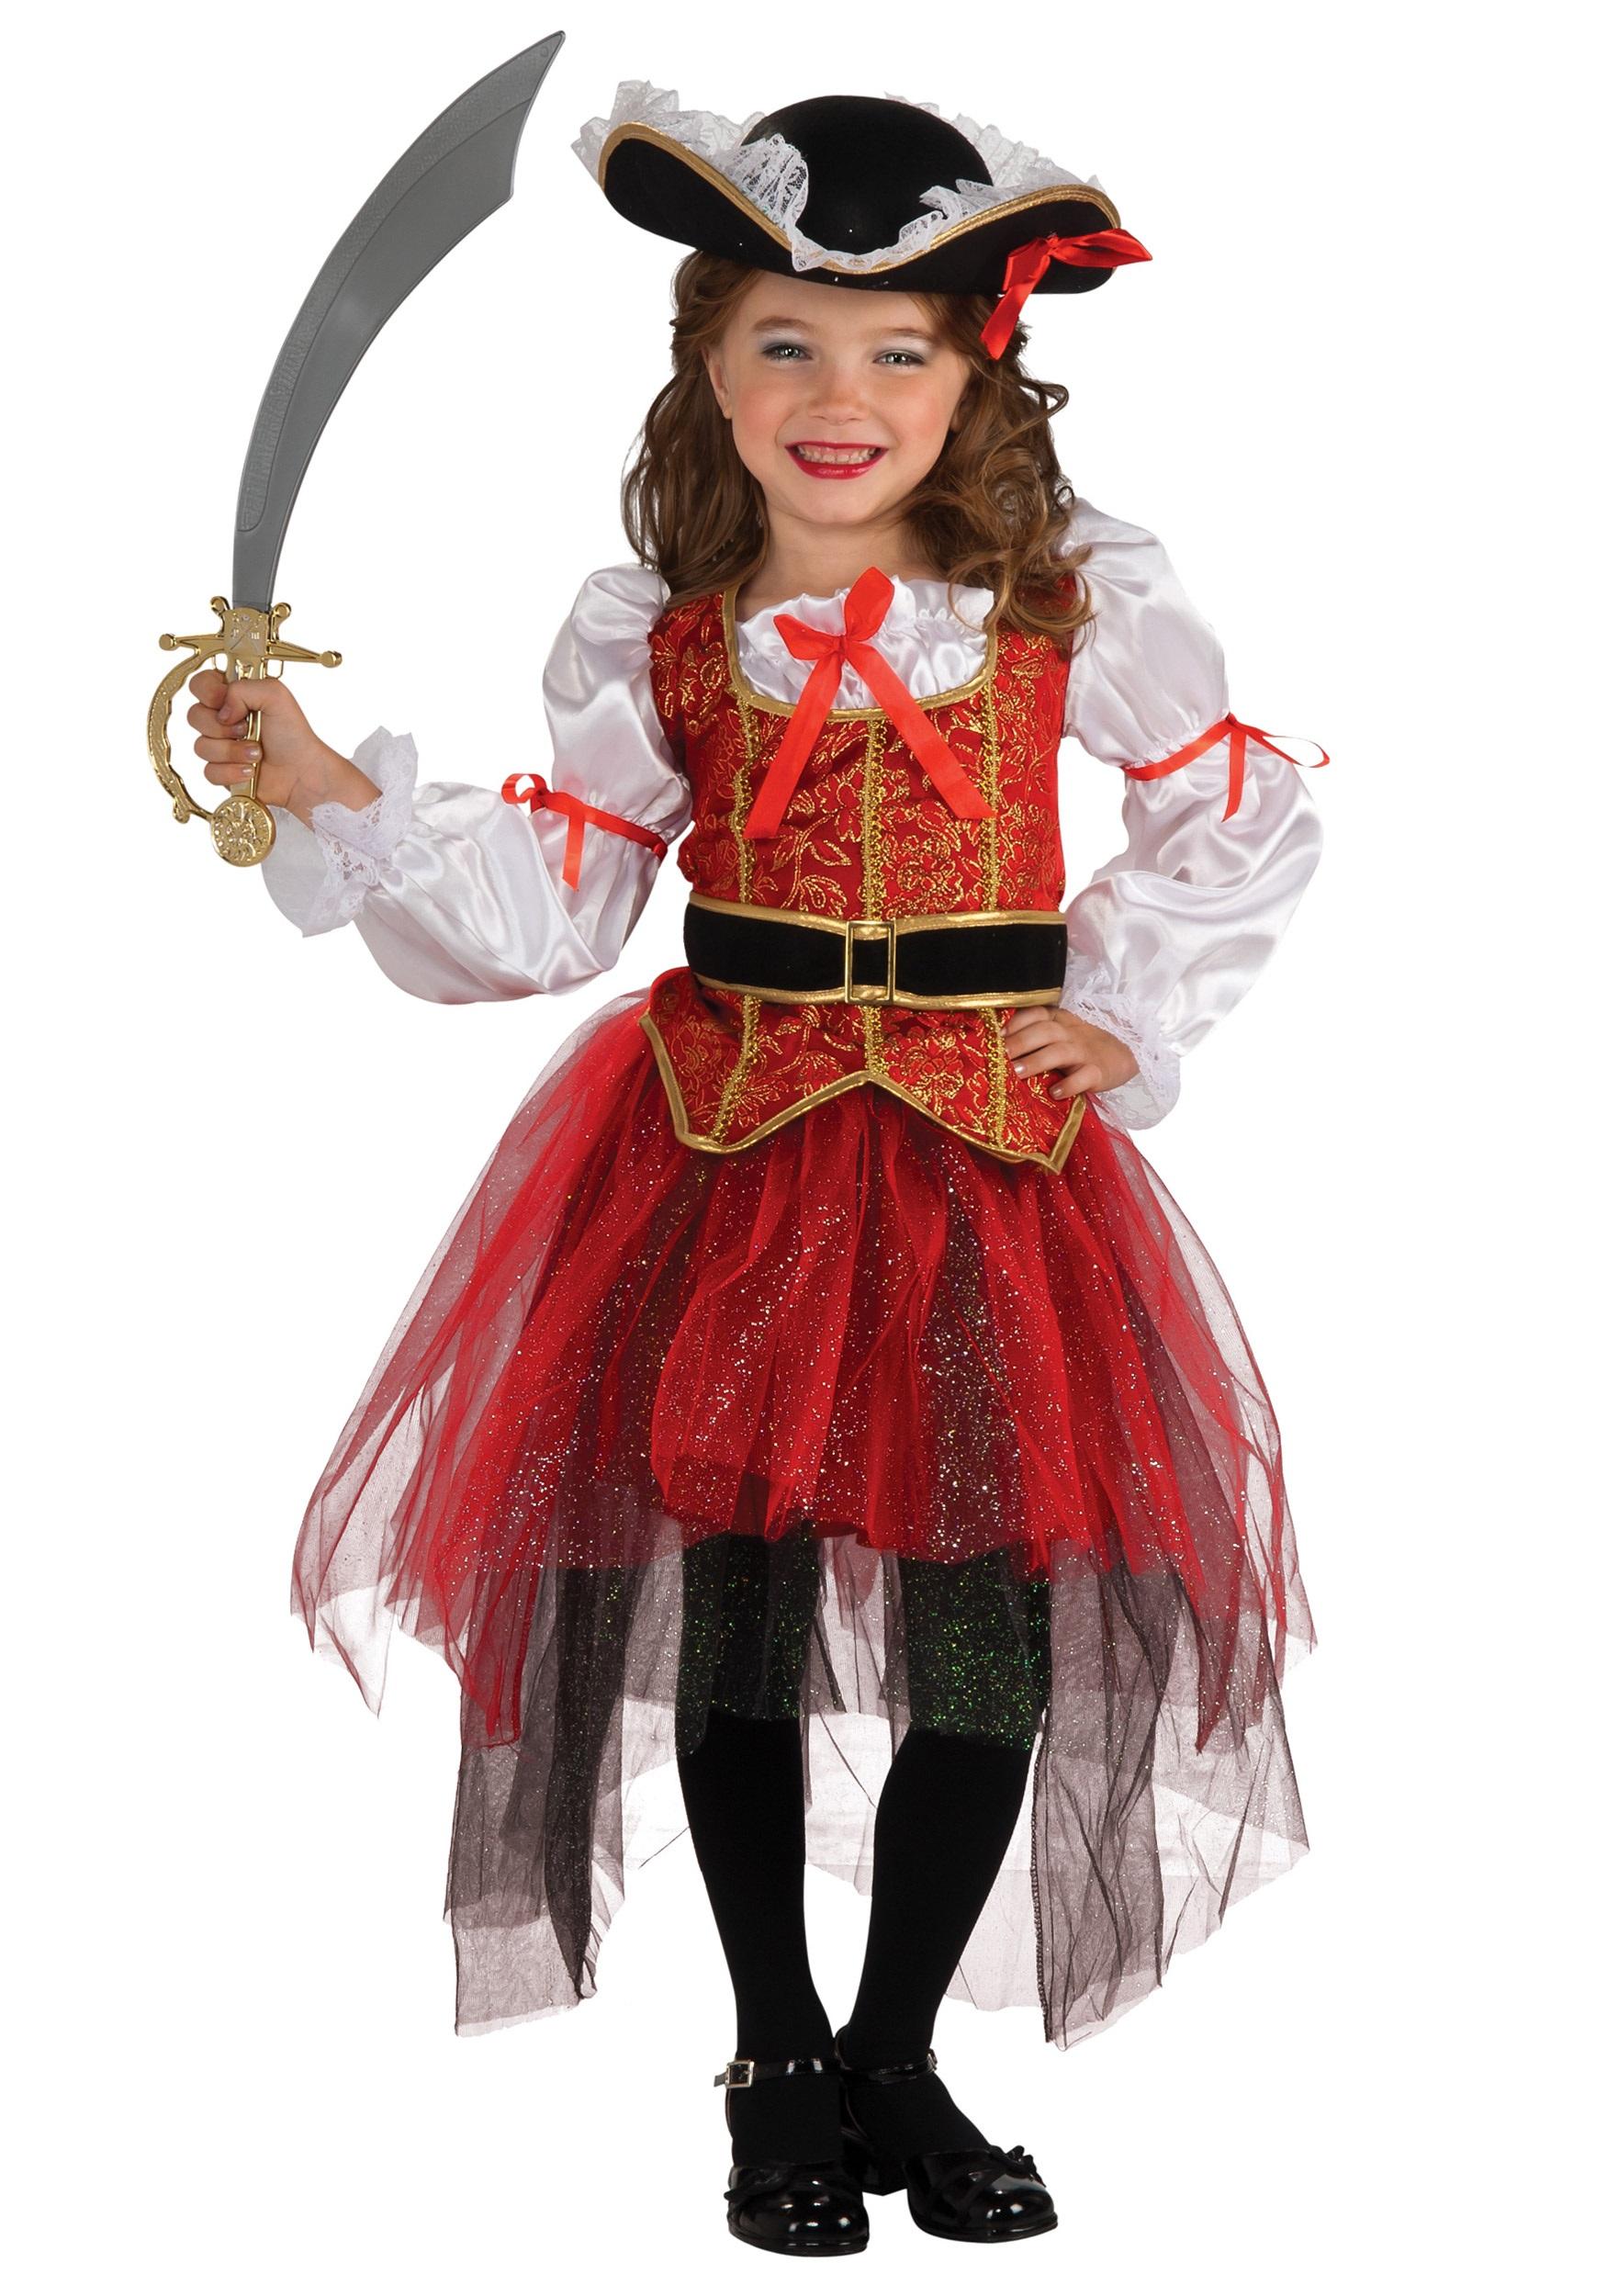 ... princess sea pirate s costume ...  sc 1 st  Best Kids Costumes & Spartan Costume Kids - Best Kids Costumes